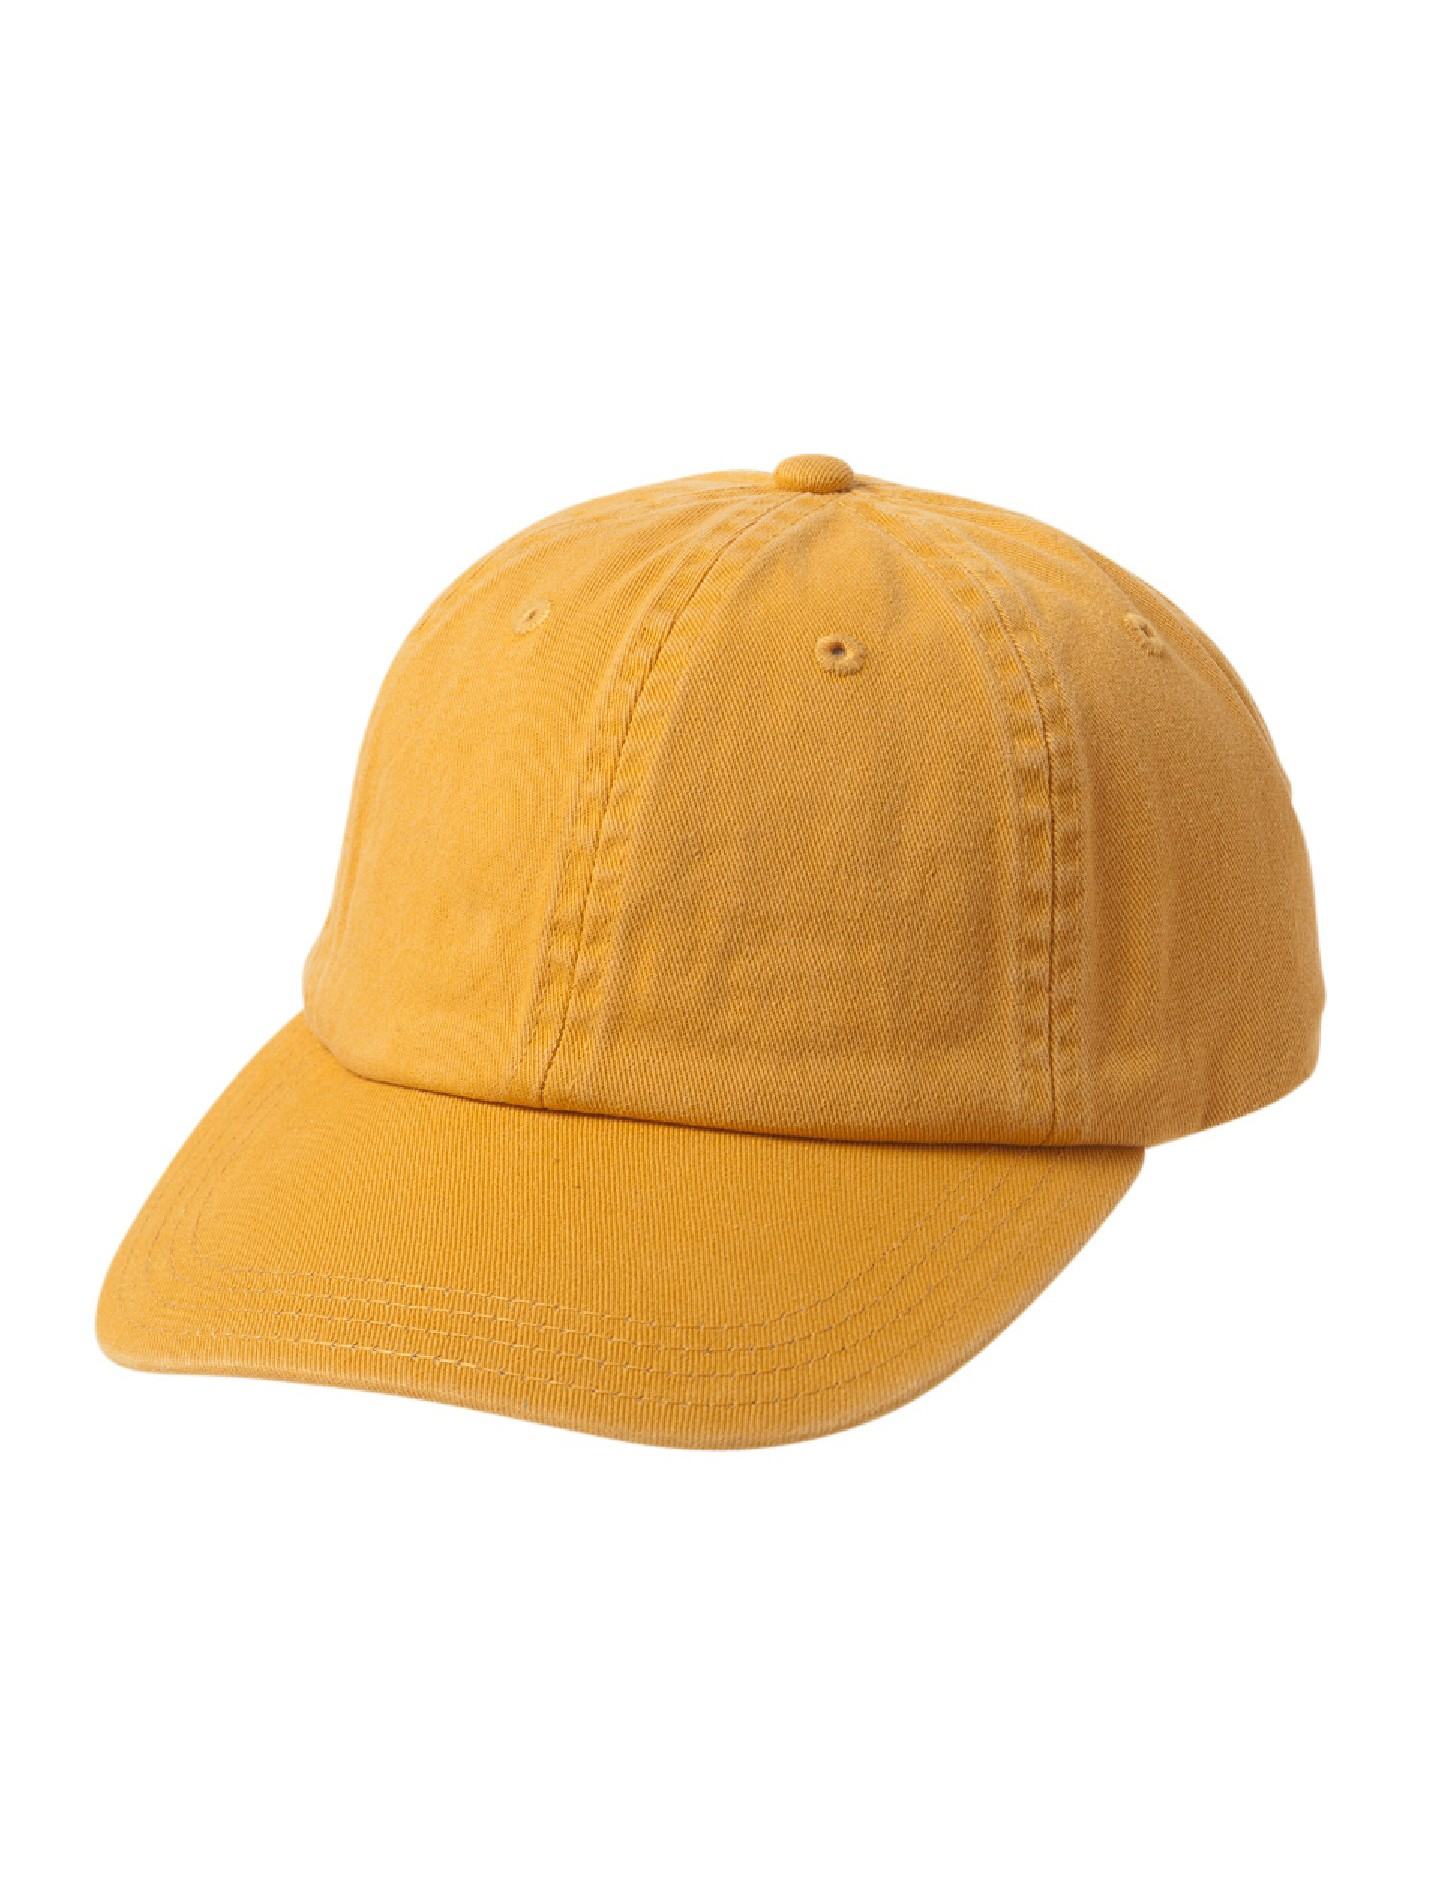 316c77e9 Alternative Apparel Dad Cap - Black Os in 2019 | Products | Dad caps ...